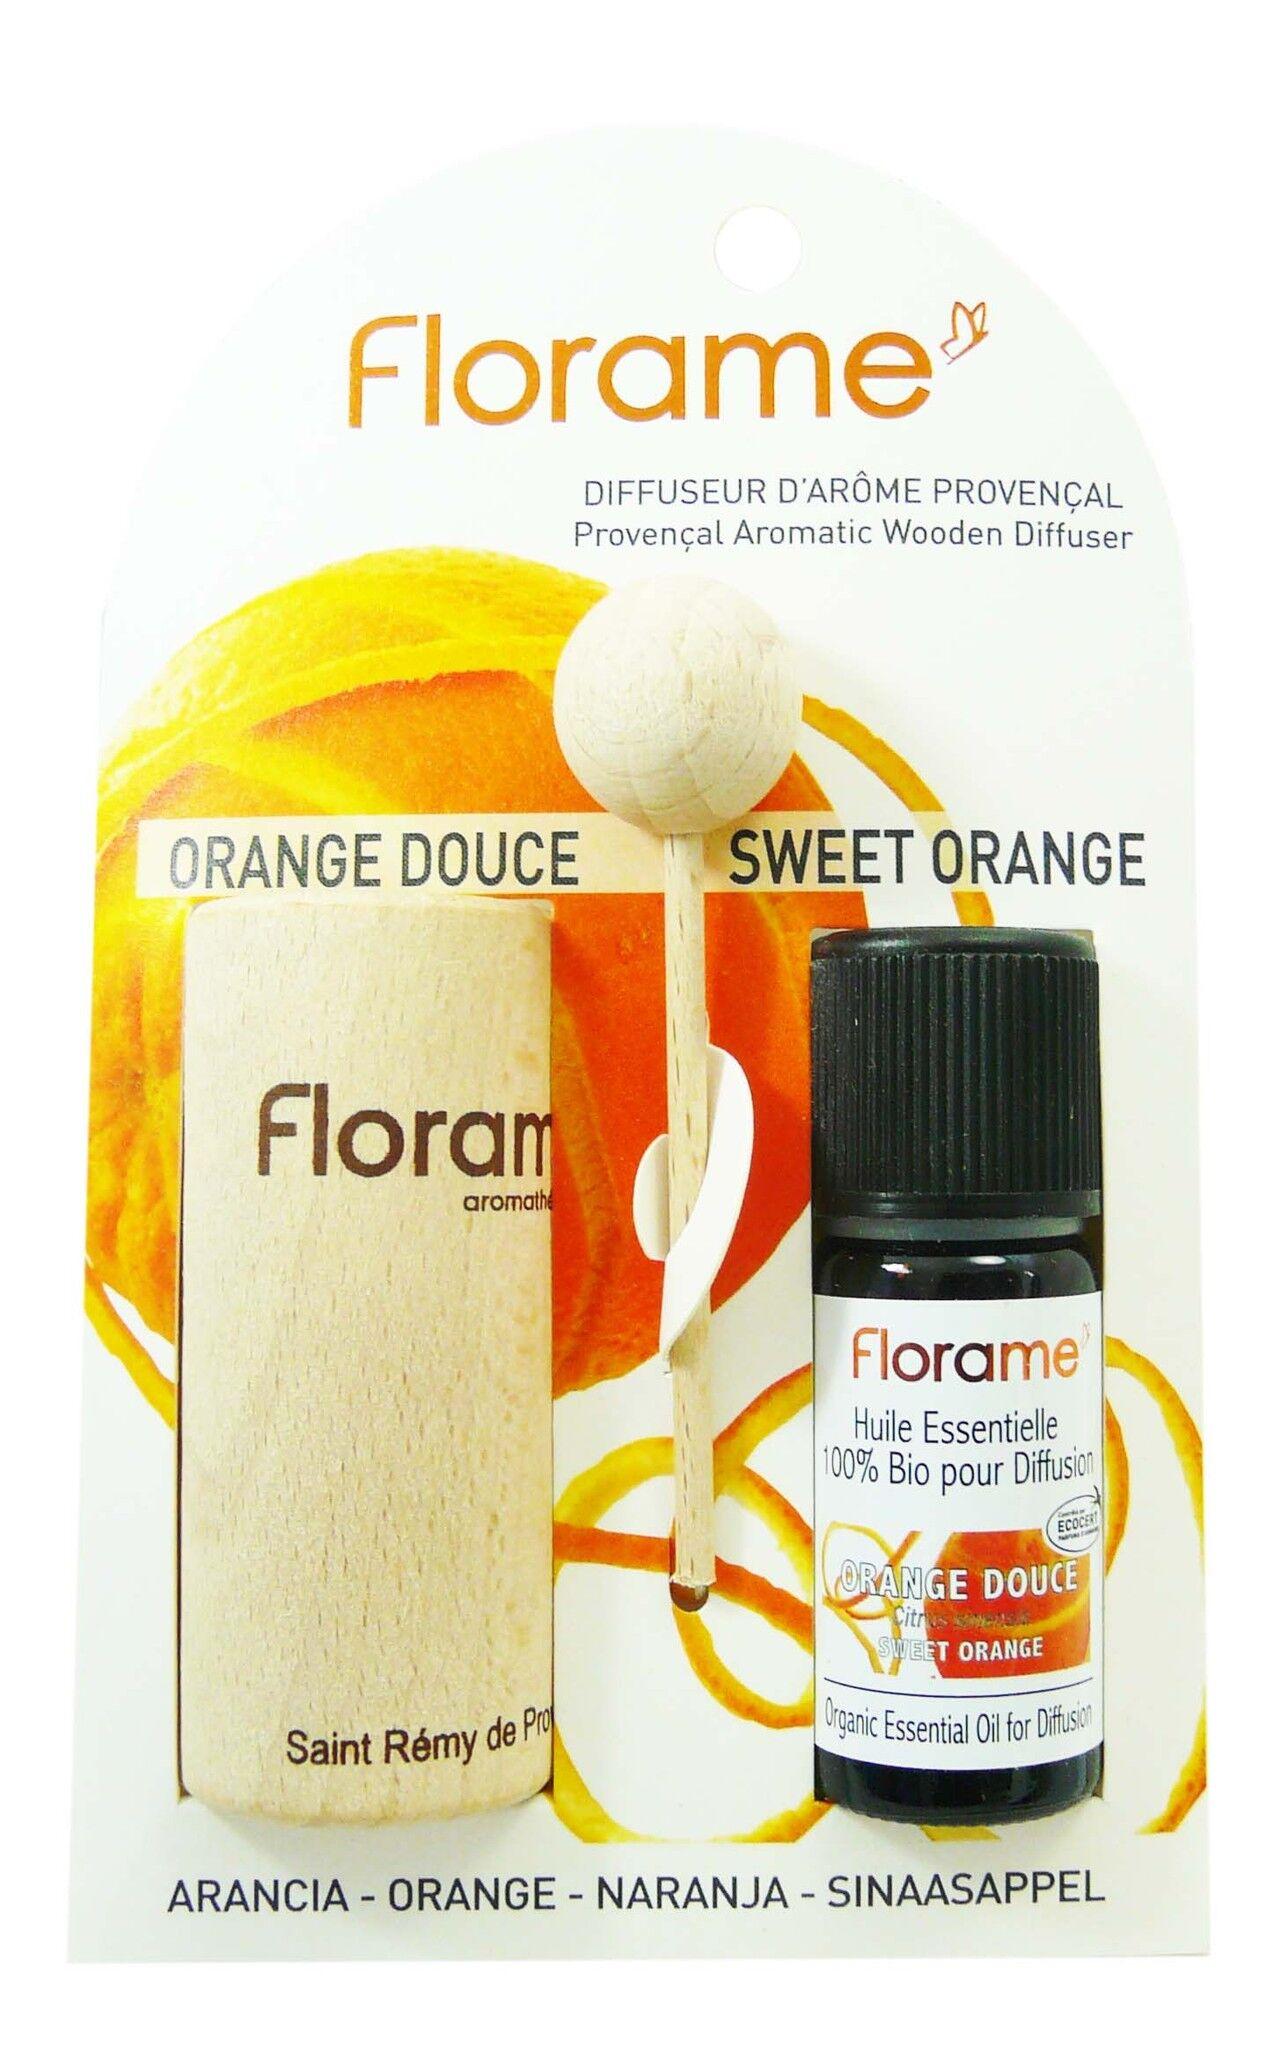 Florame diffuseur d'arome provencal orange douce